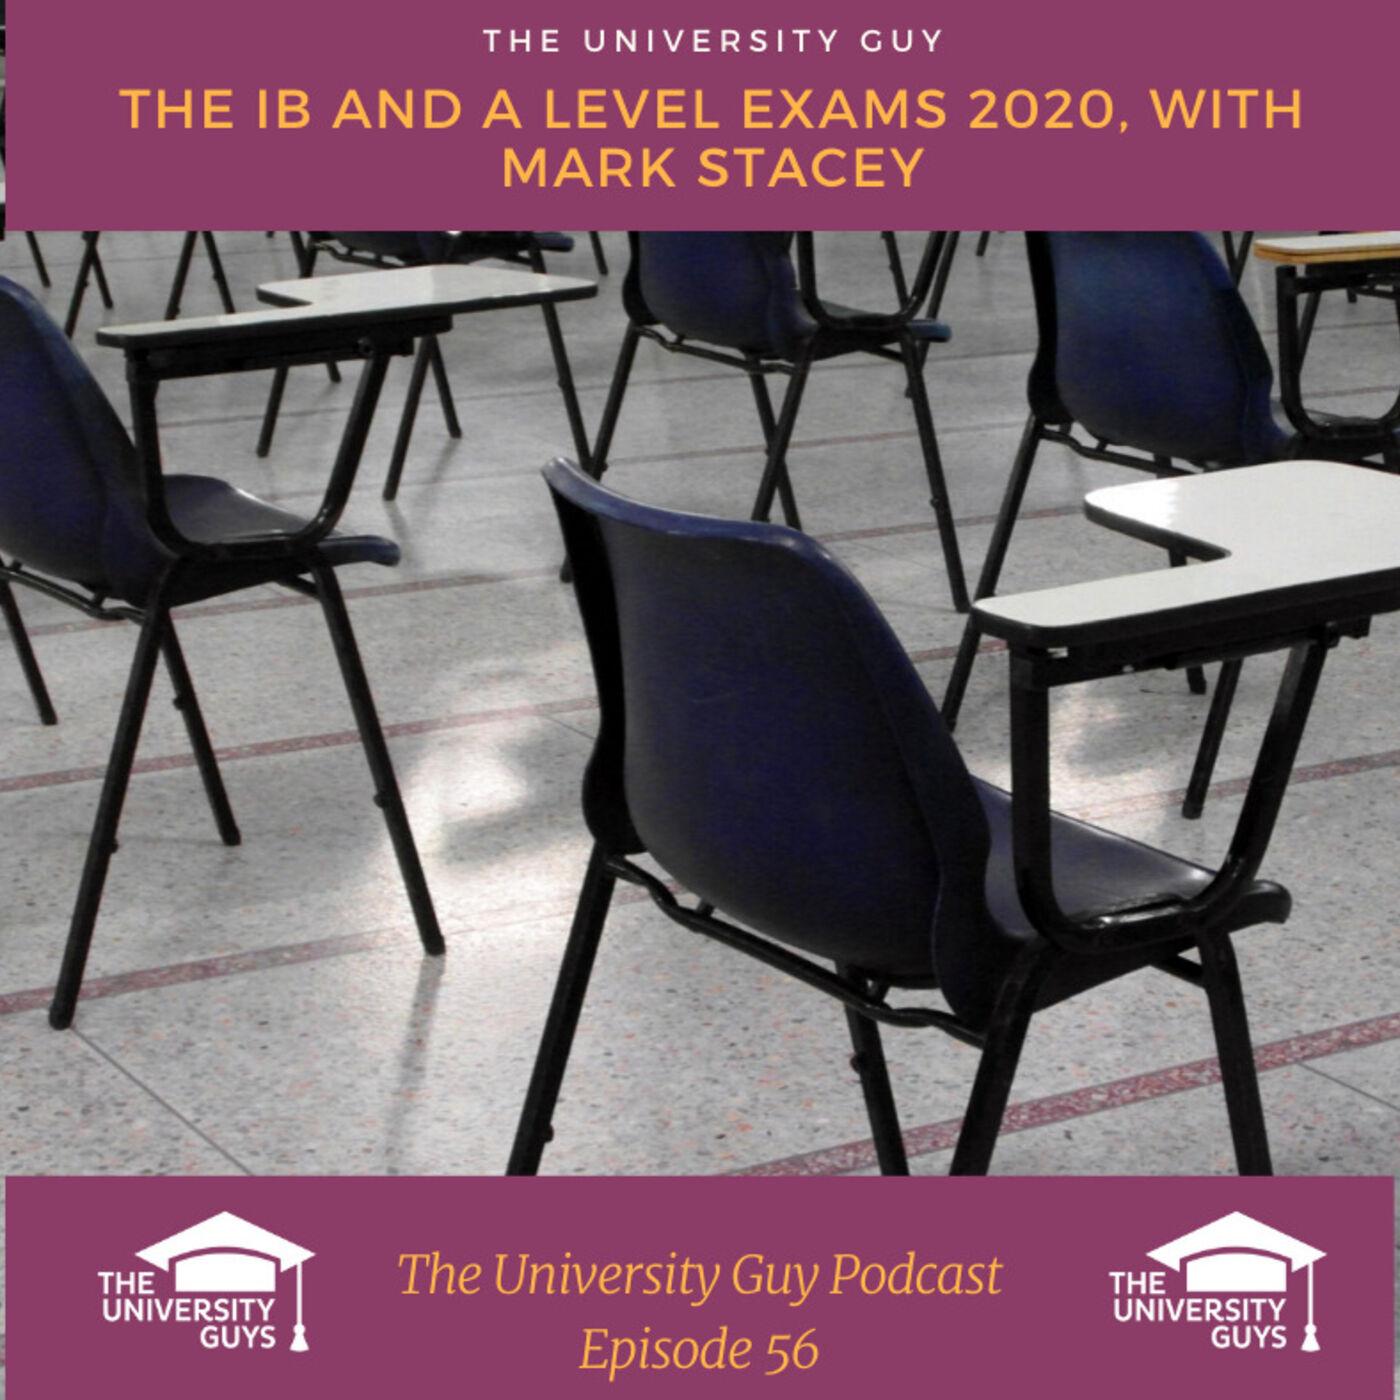 Episode 56: A Level and IB Marking, 2020 Exam Season